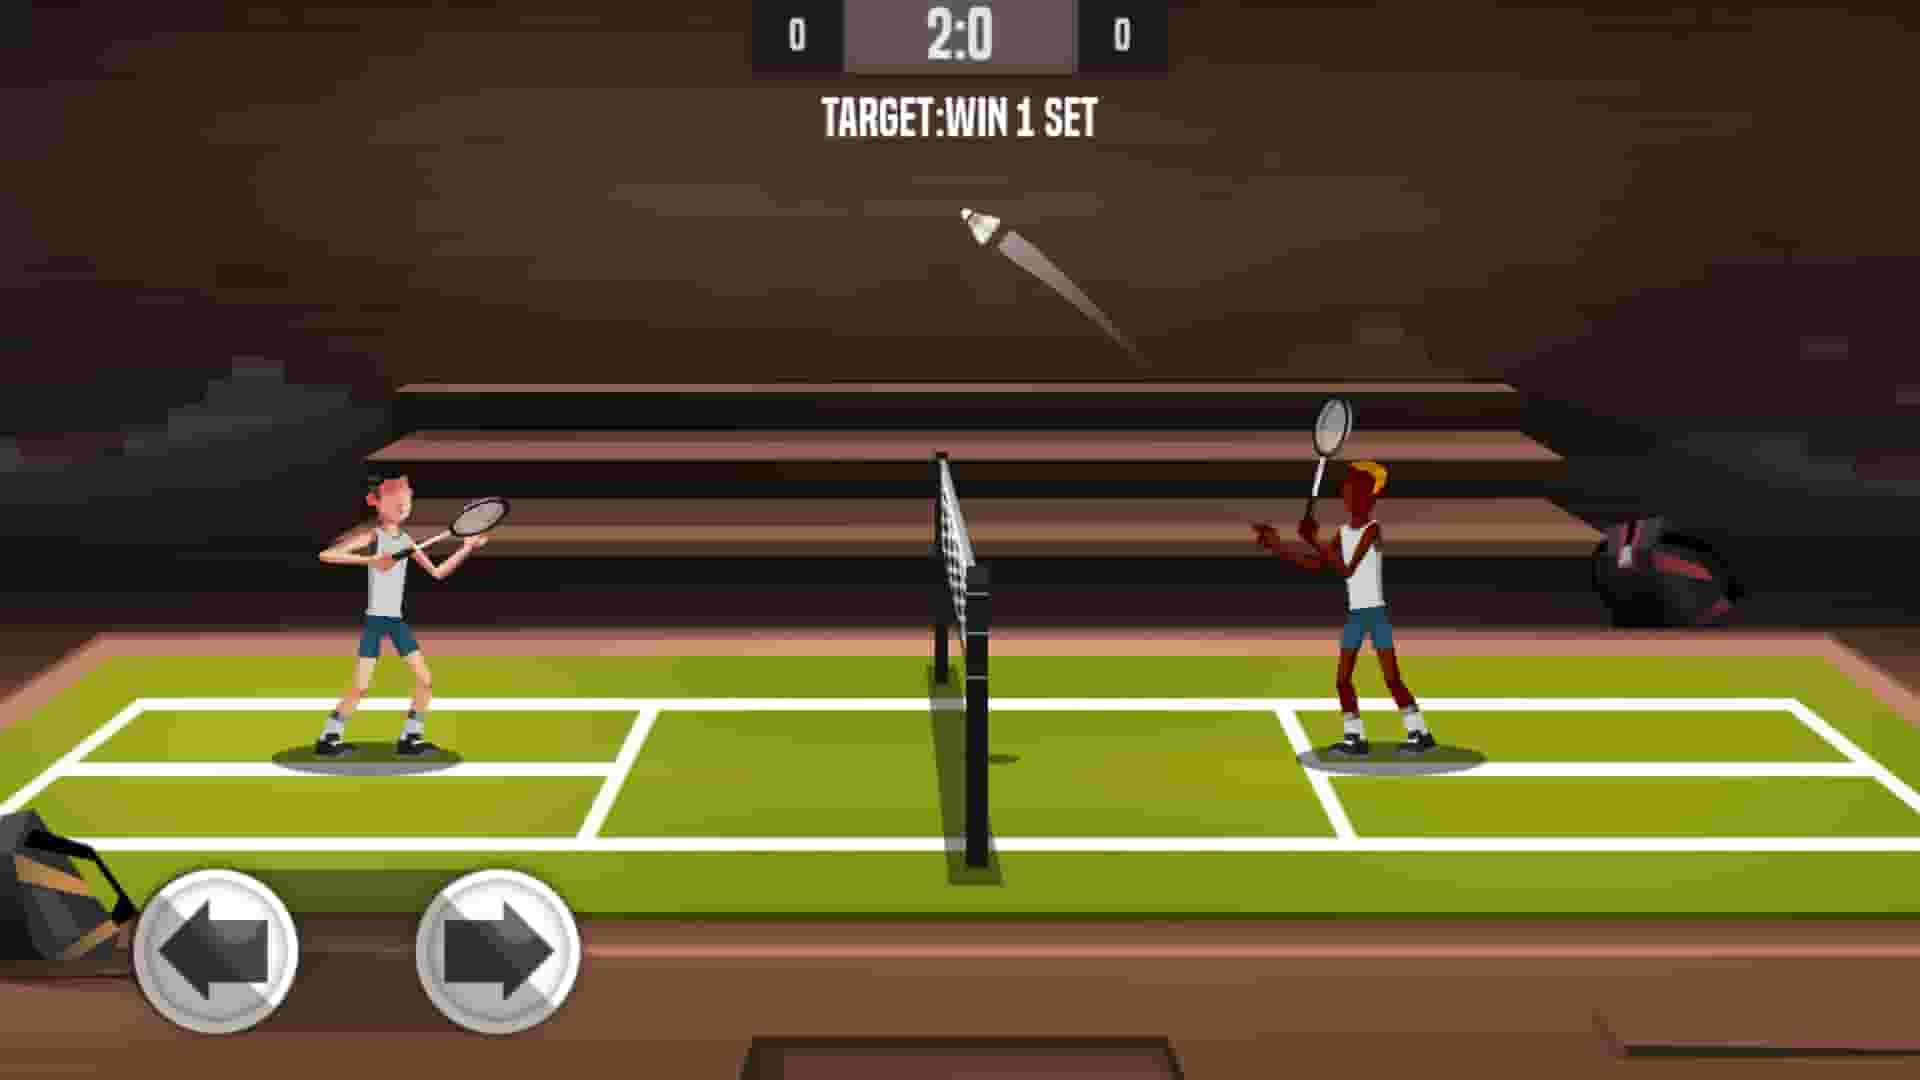 badminton league, best offline games android, android best offline games